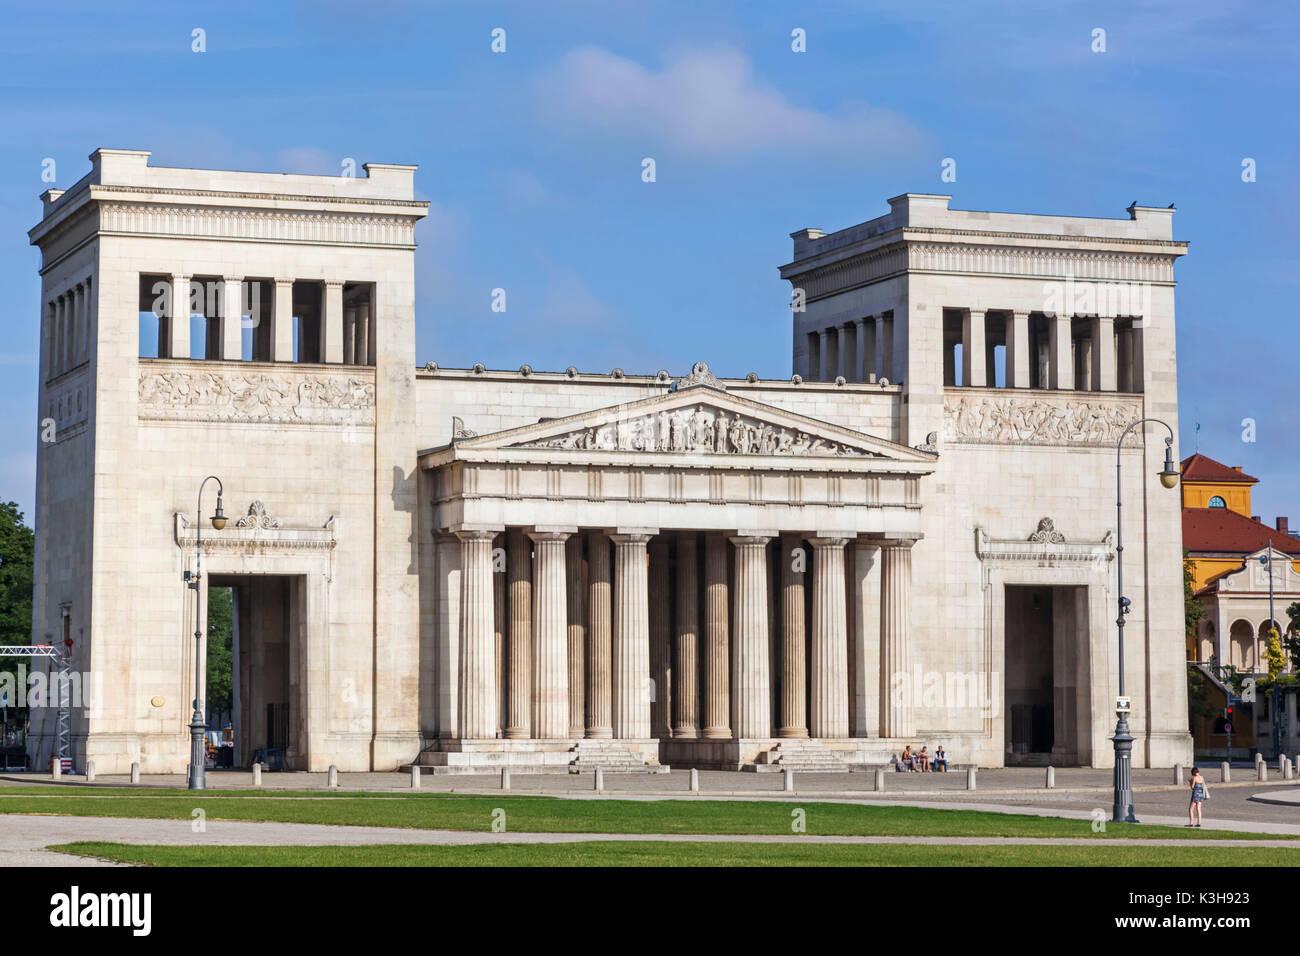 Germany, Bavaria, Munich, Glyptothek Museum, The Propylaea Gate - Stock Image